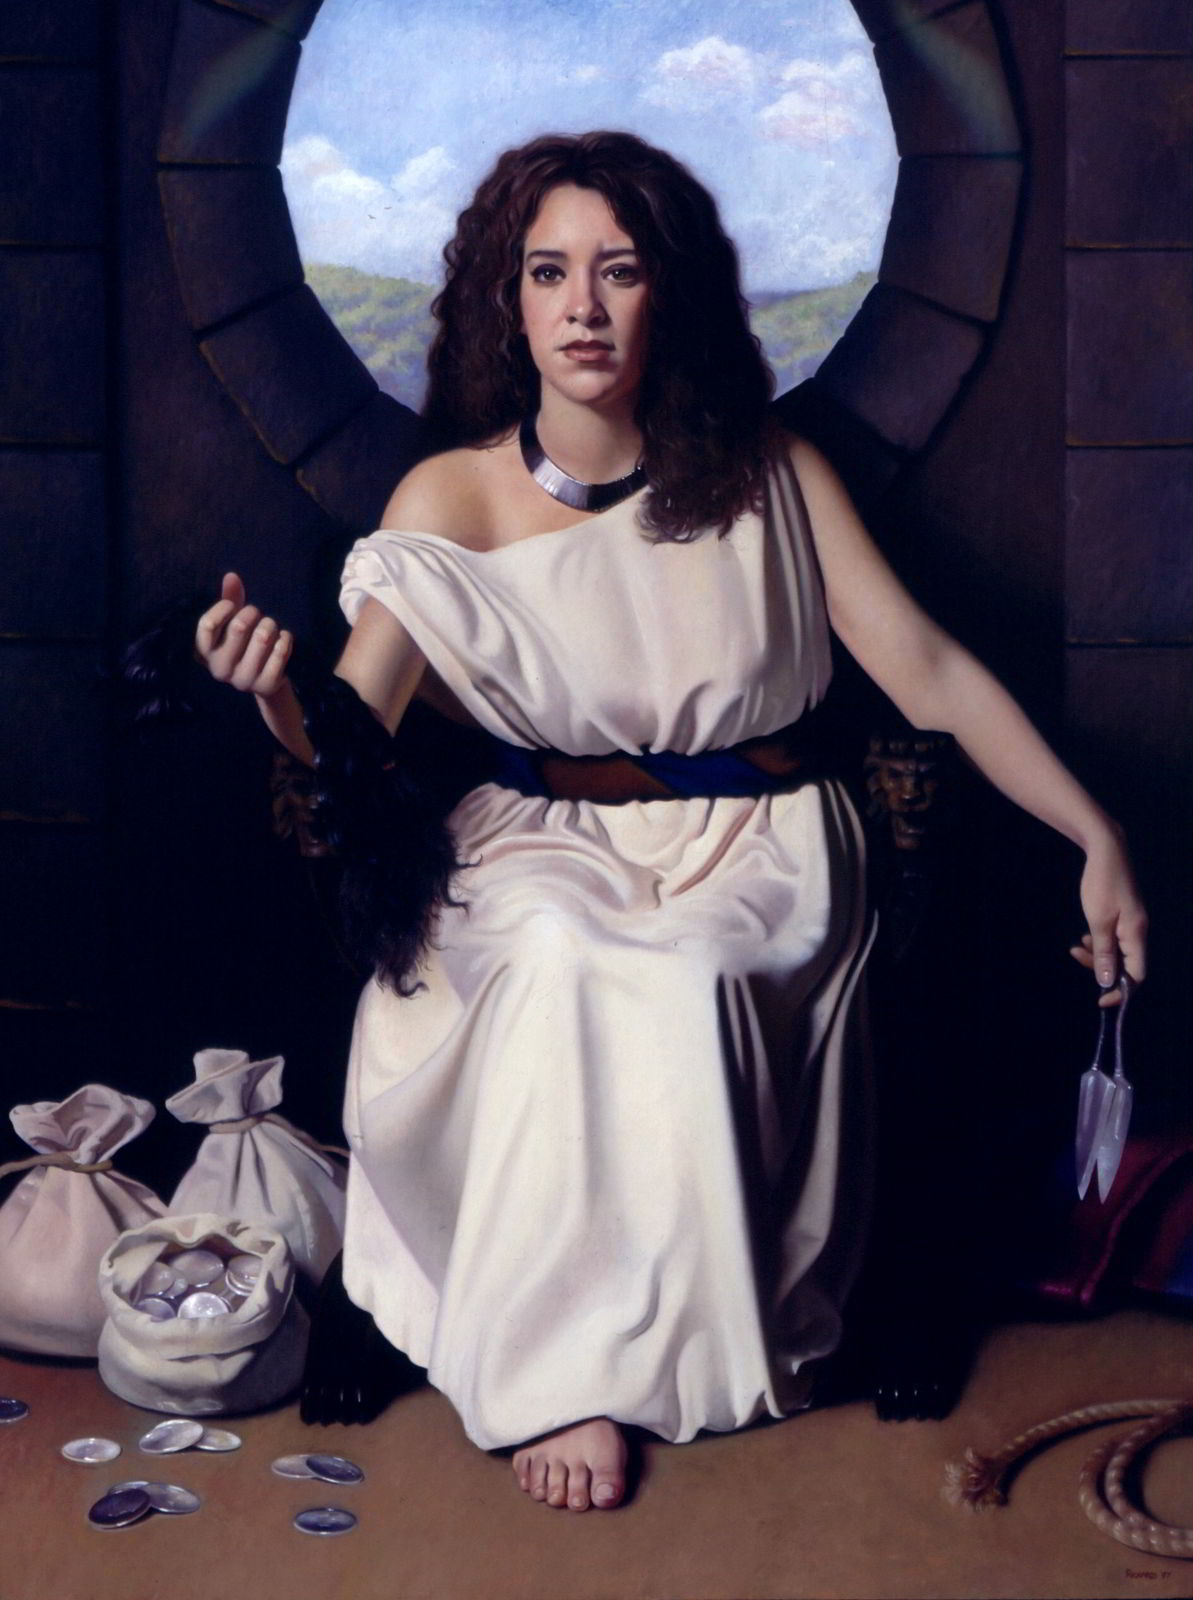 Delilah by Kirk Richards